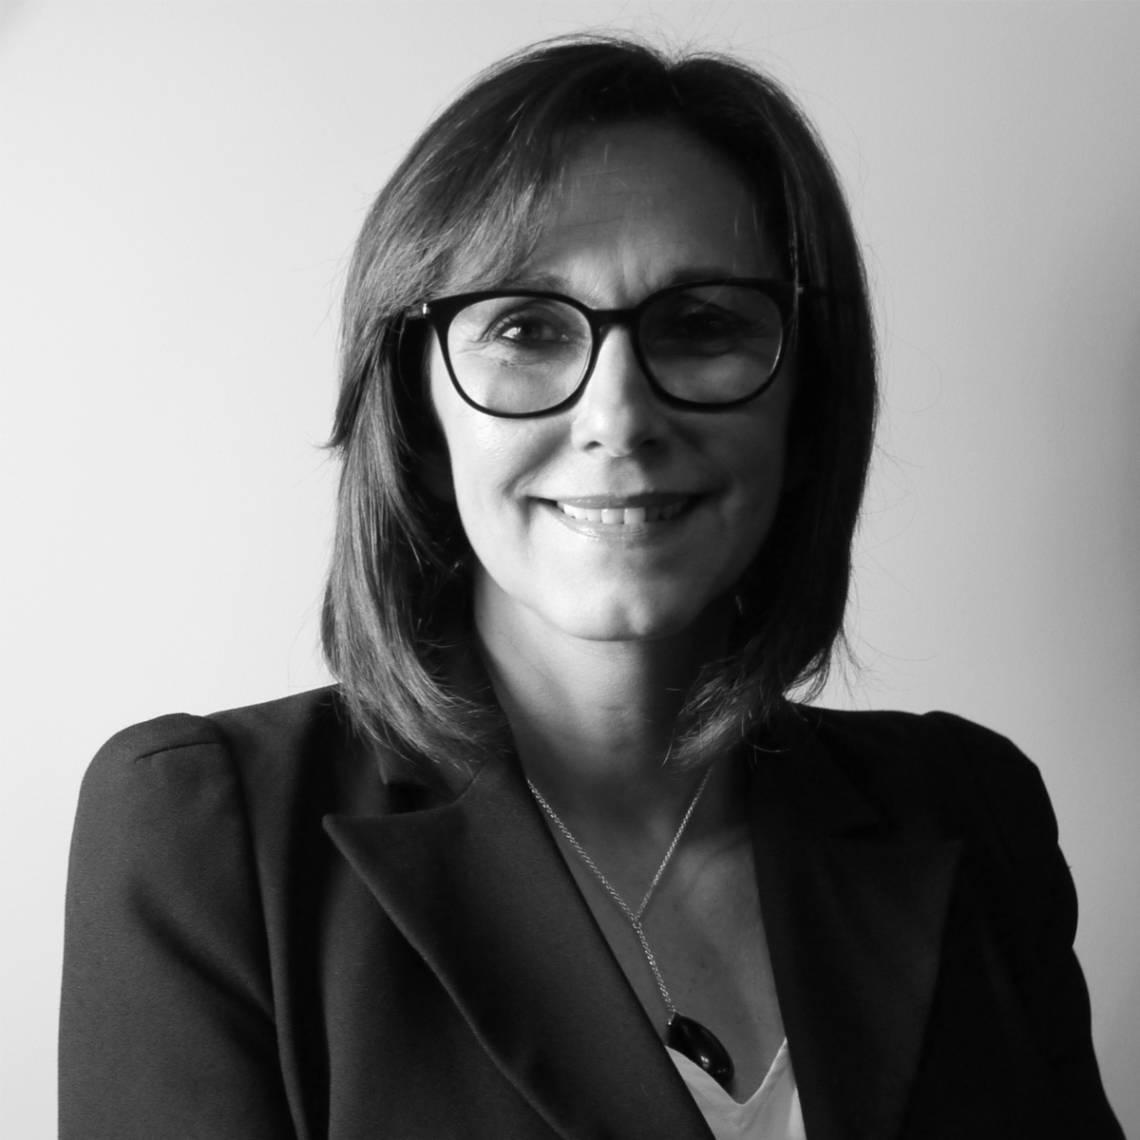 Marie Laurence Leroy